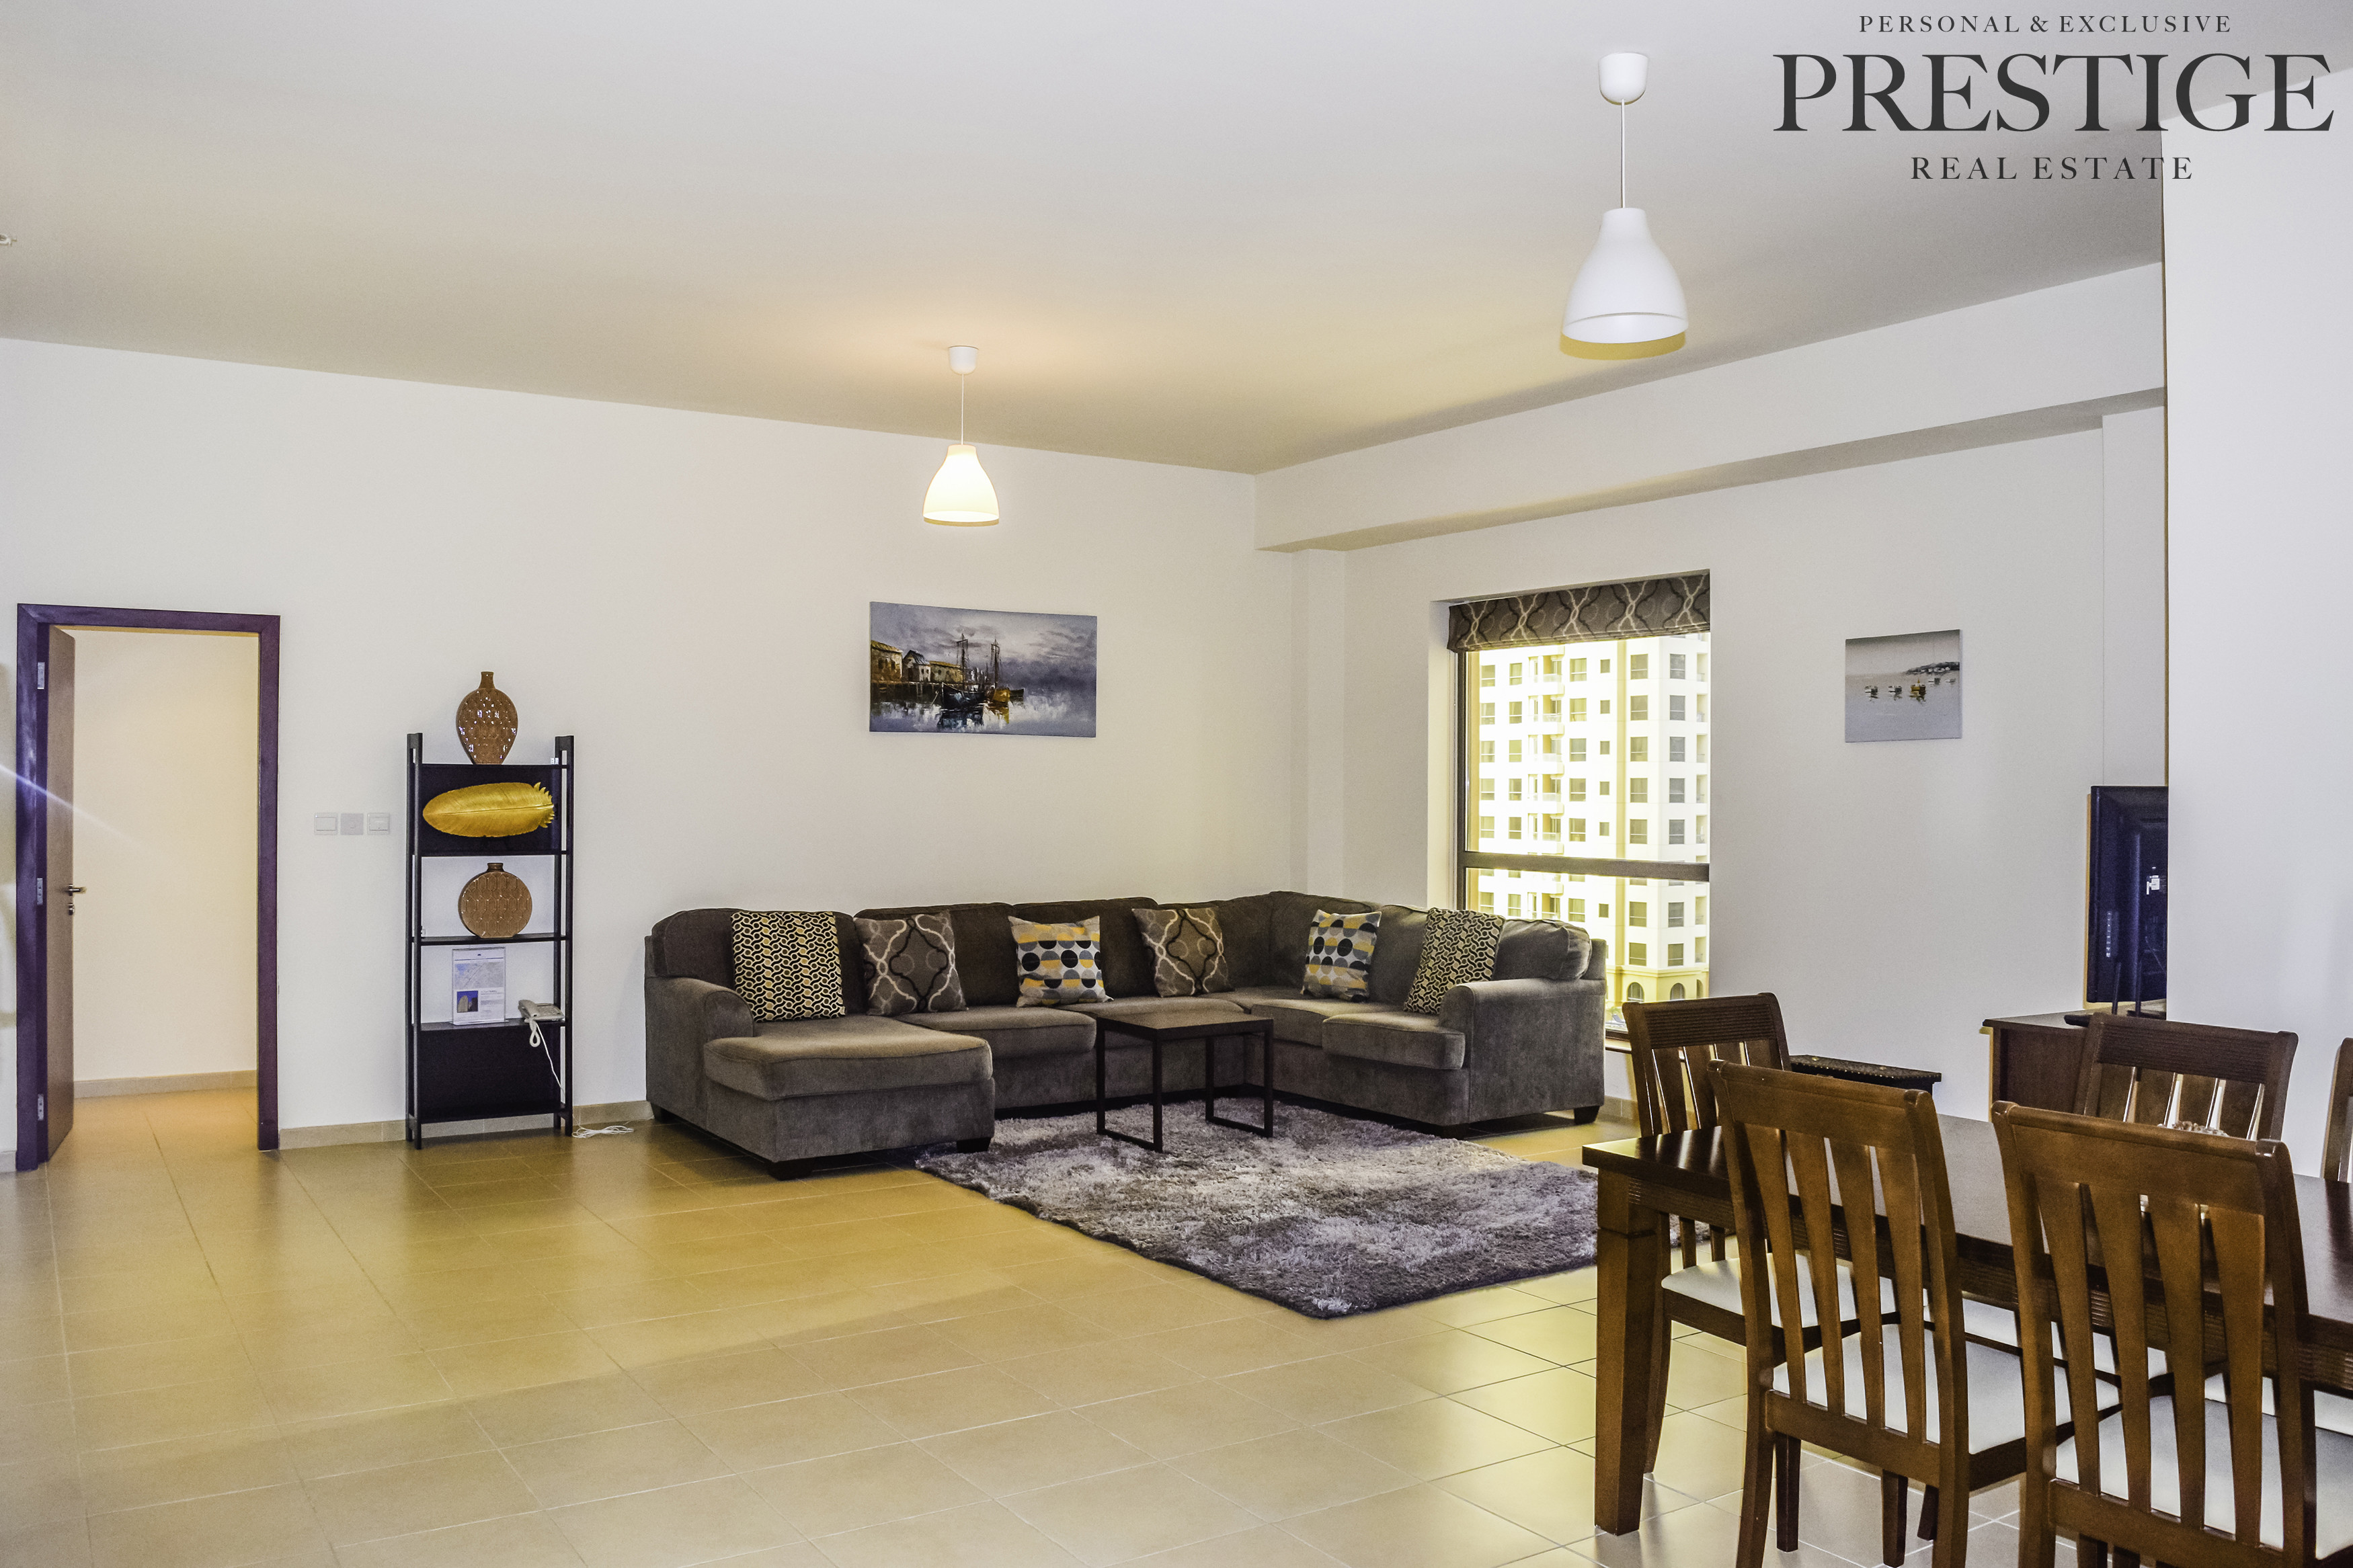 furnished-large-i-1-bedroom-nice-view